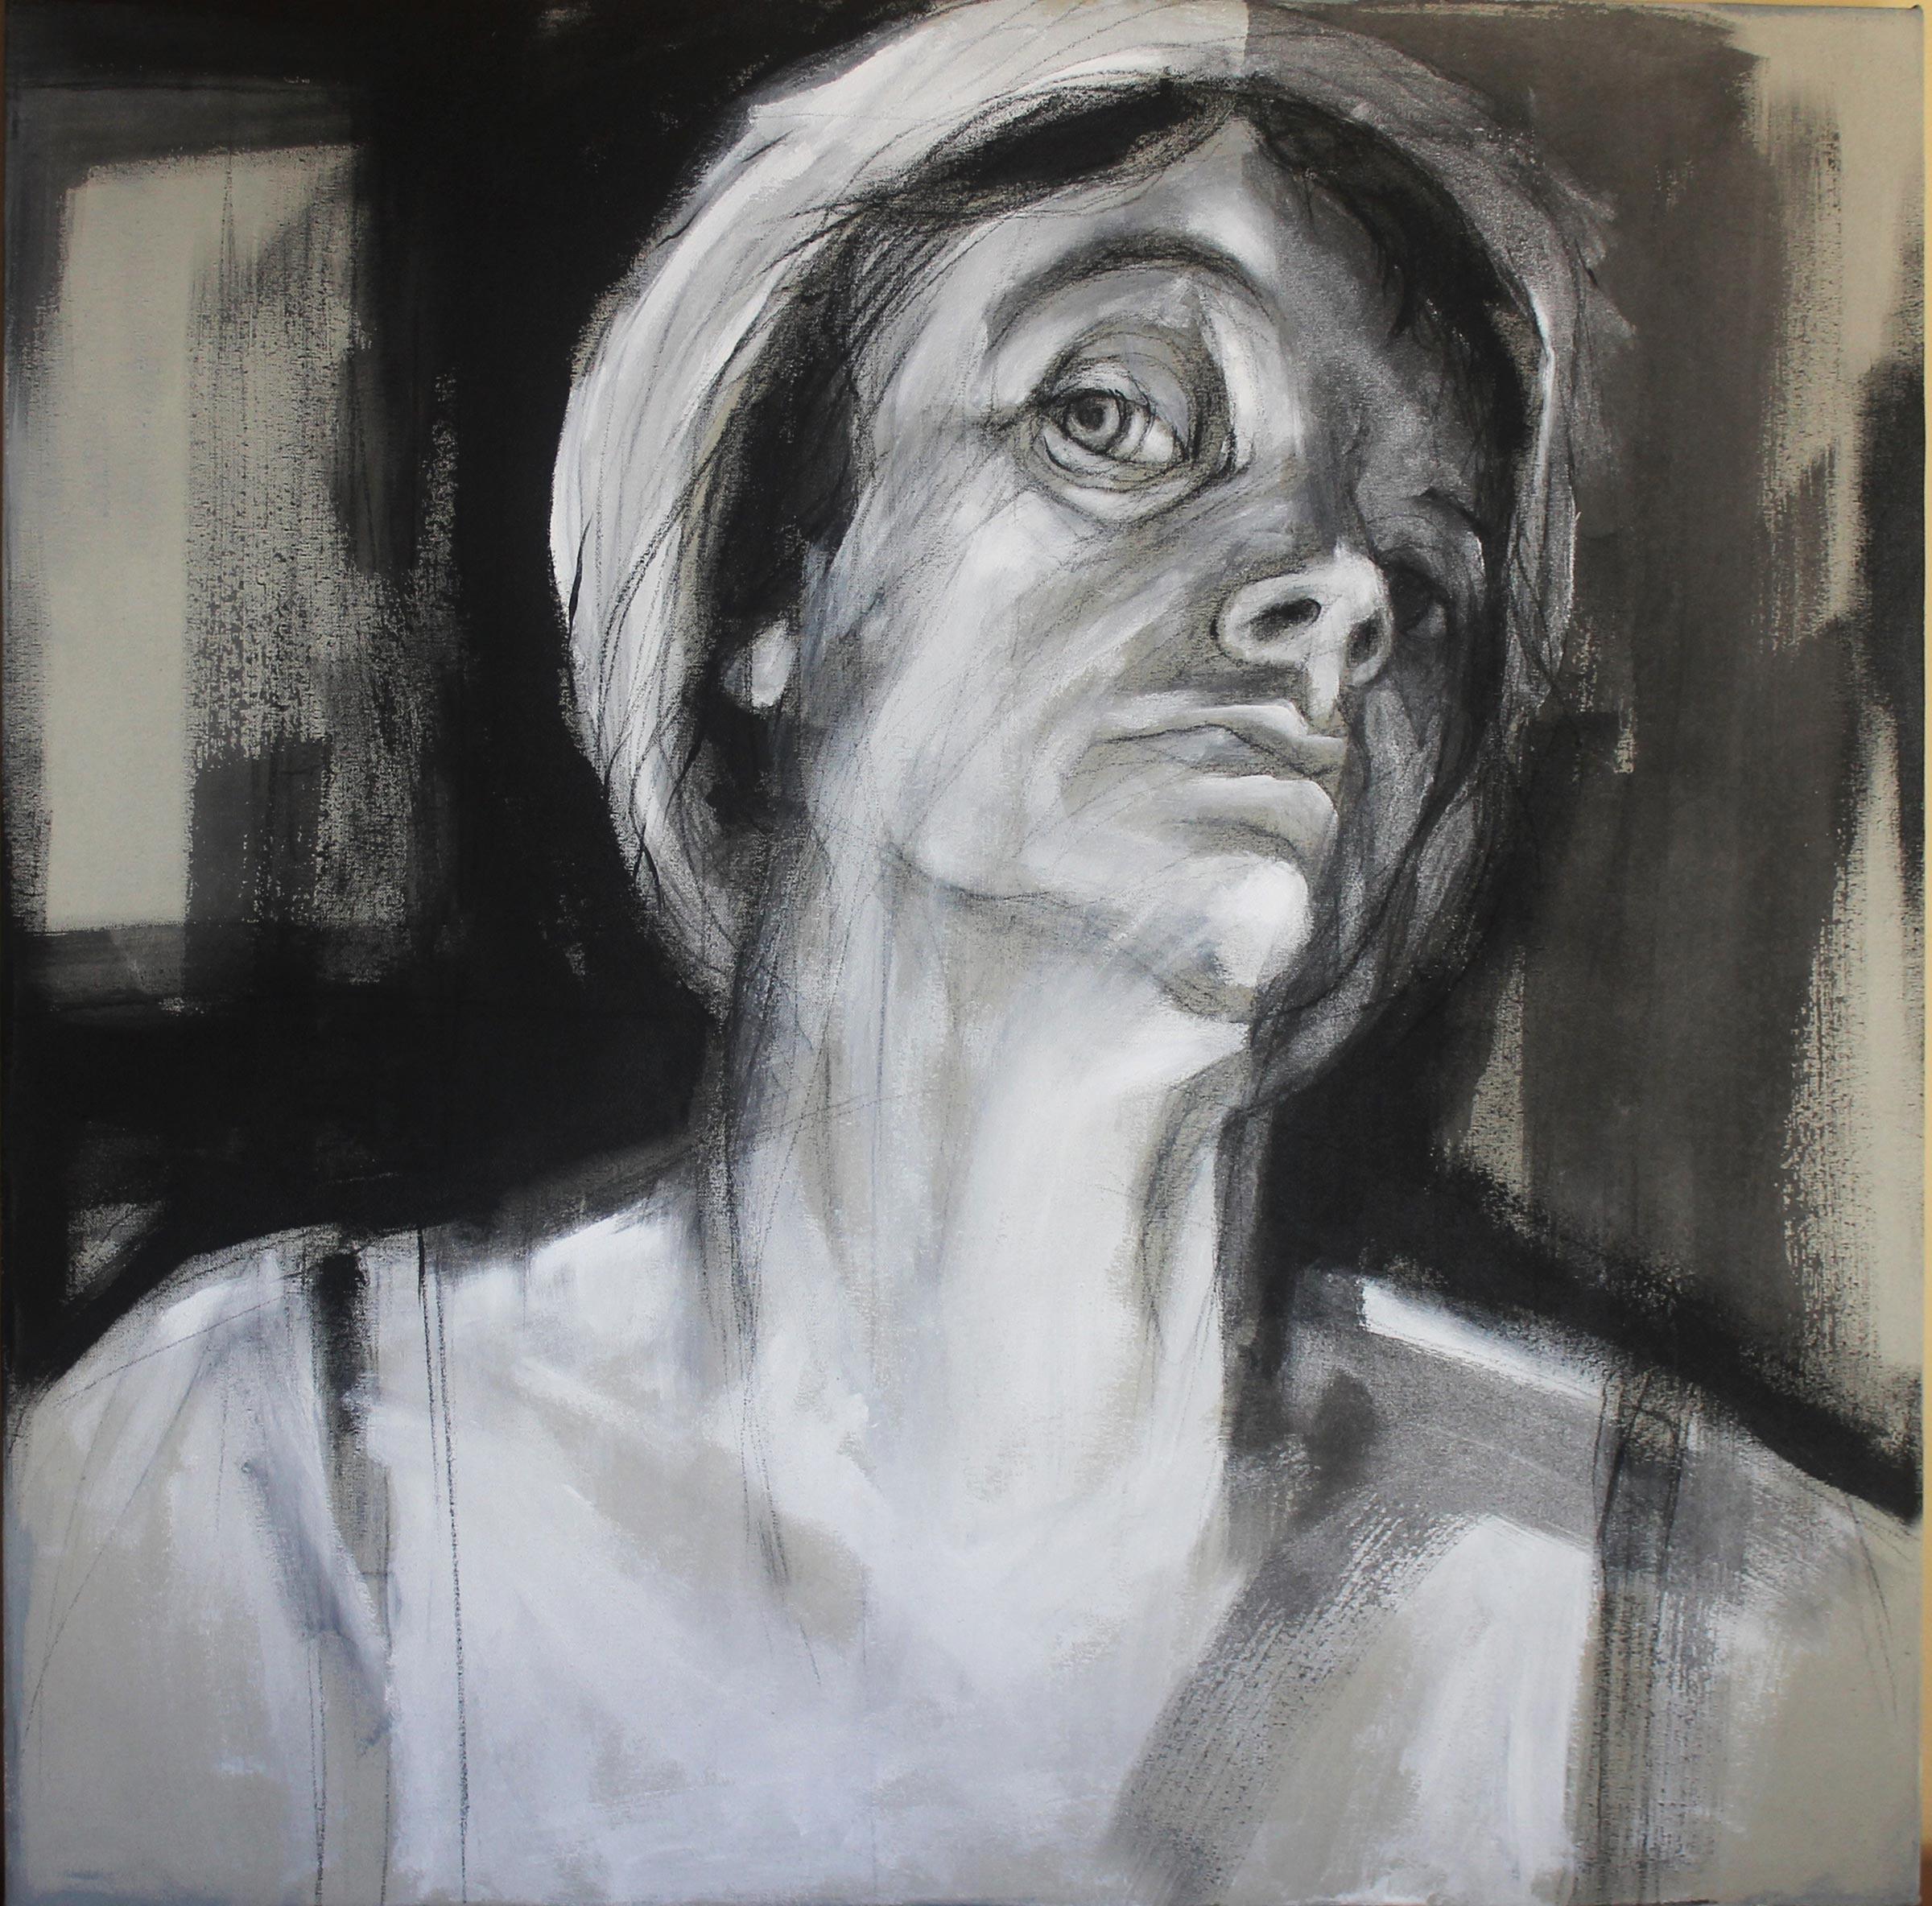 Finalist- Rhonda - Darling Portrait Prize